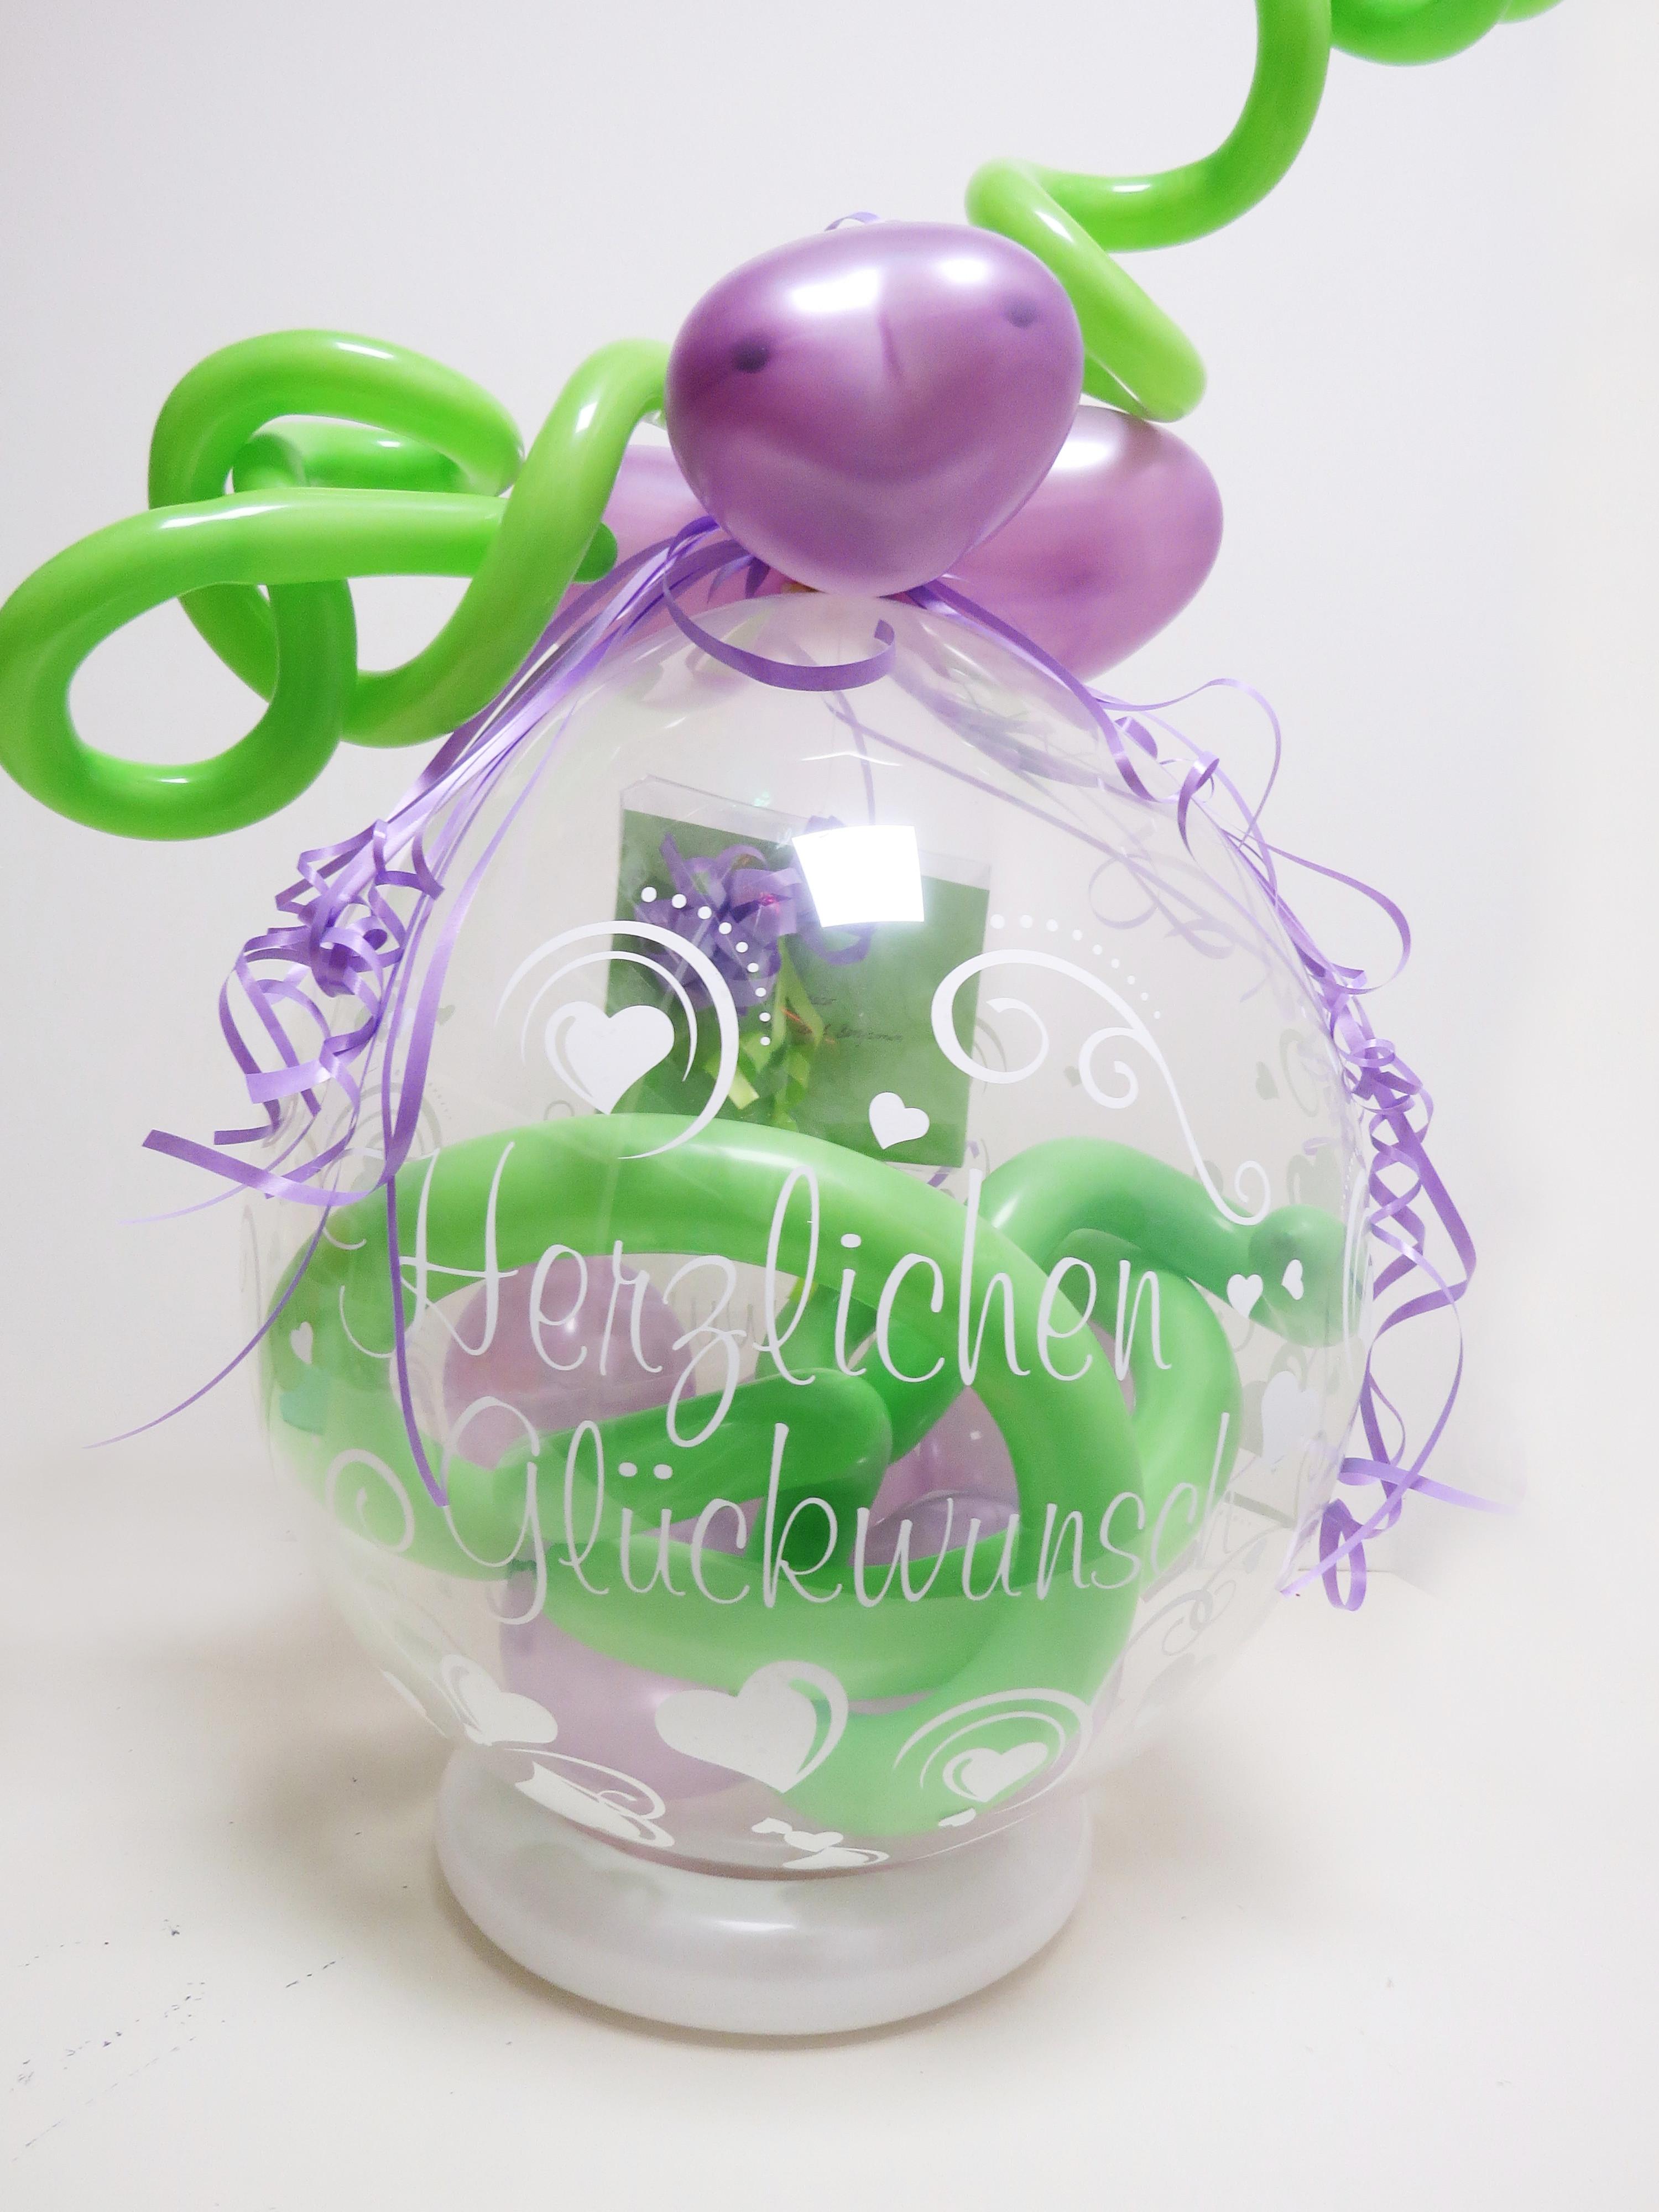 Verpackungsballon